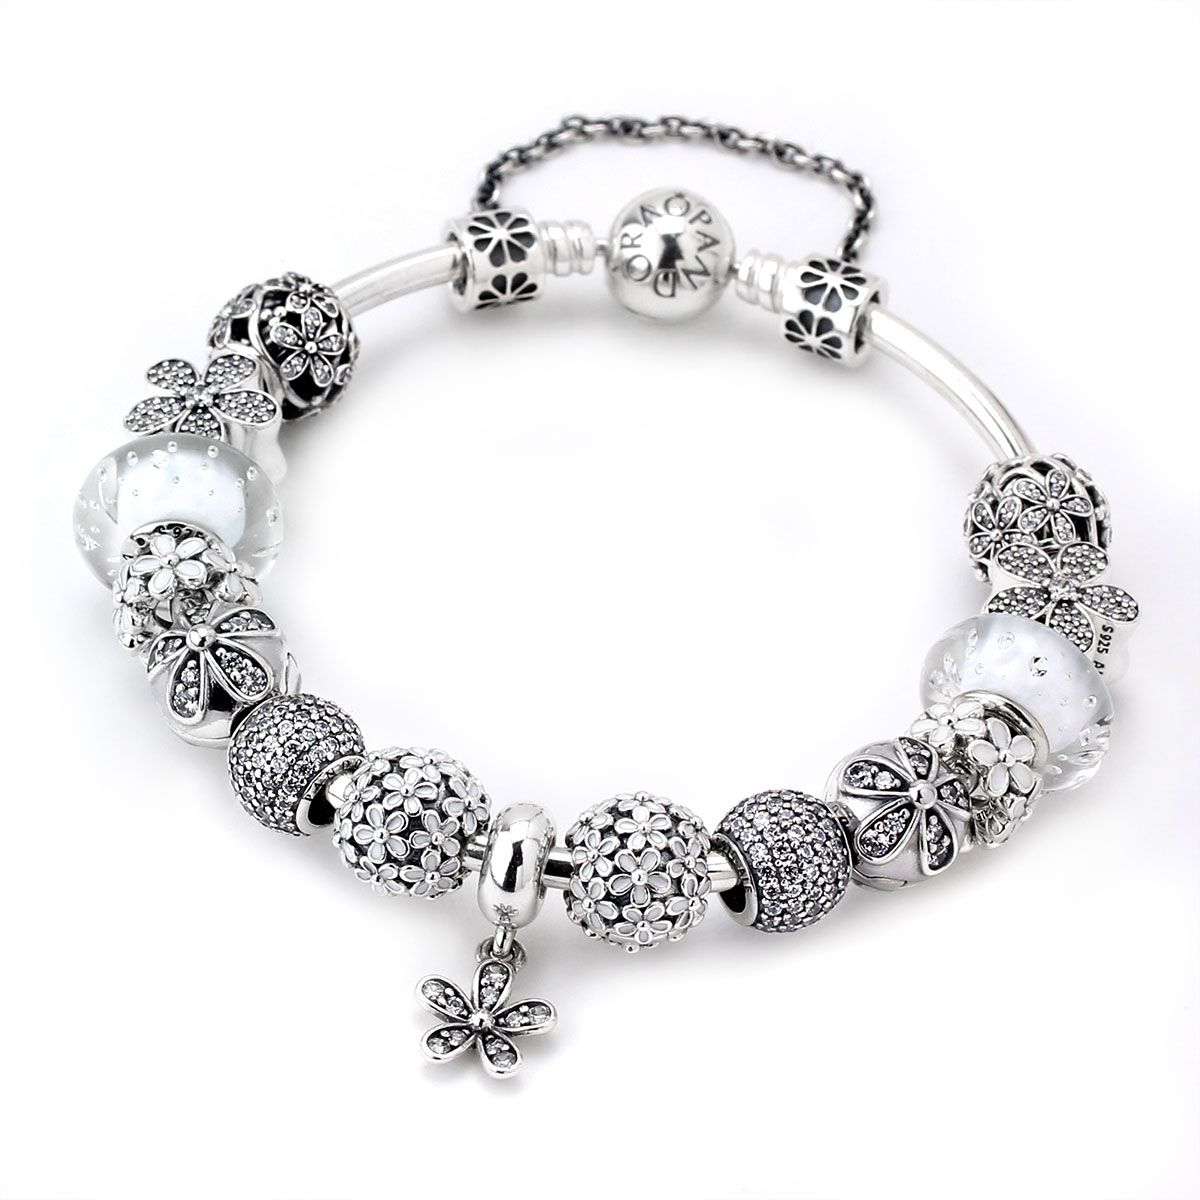 Charm Bracelets Pandora: PANDORA Upsy Daisy Charm Bracelet